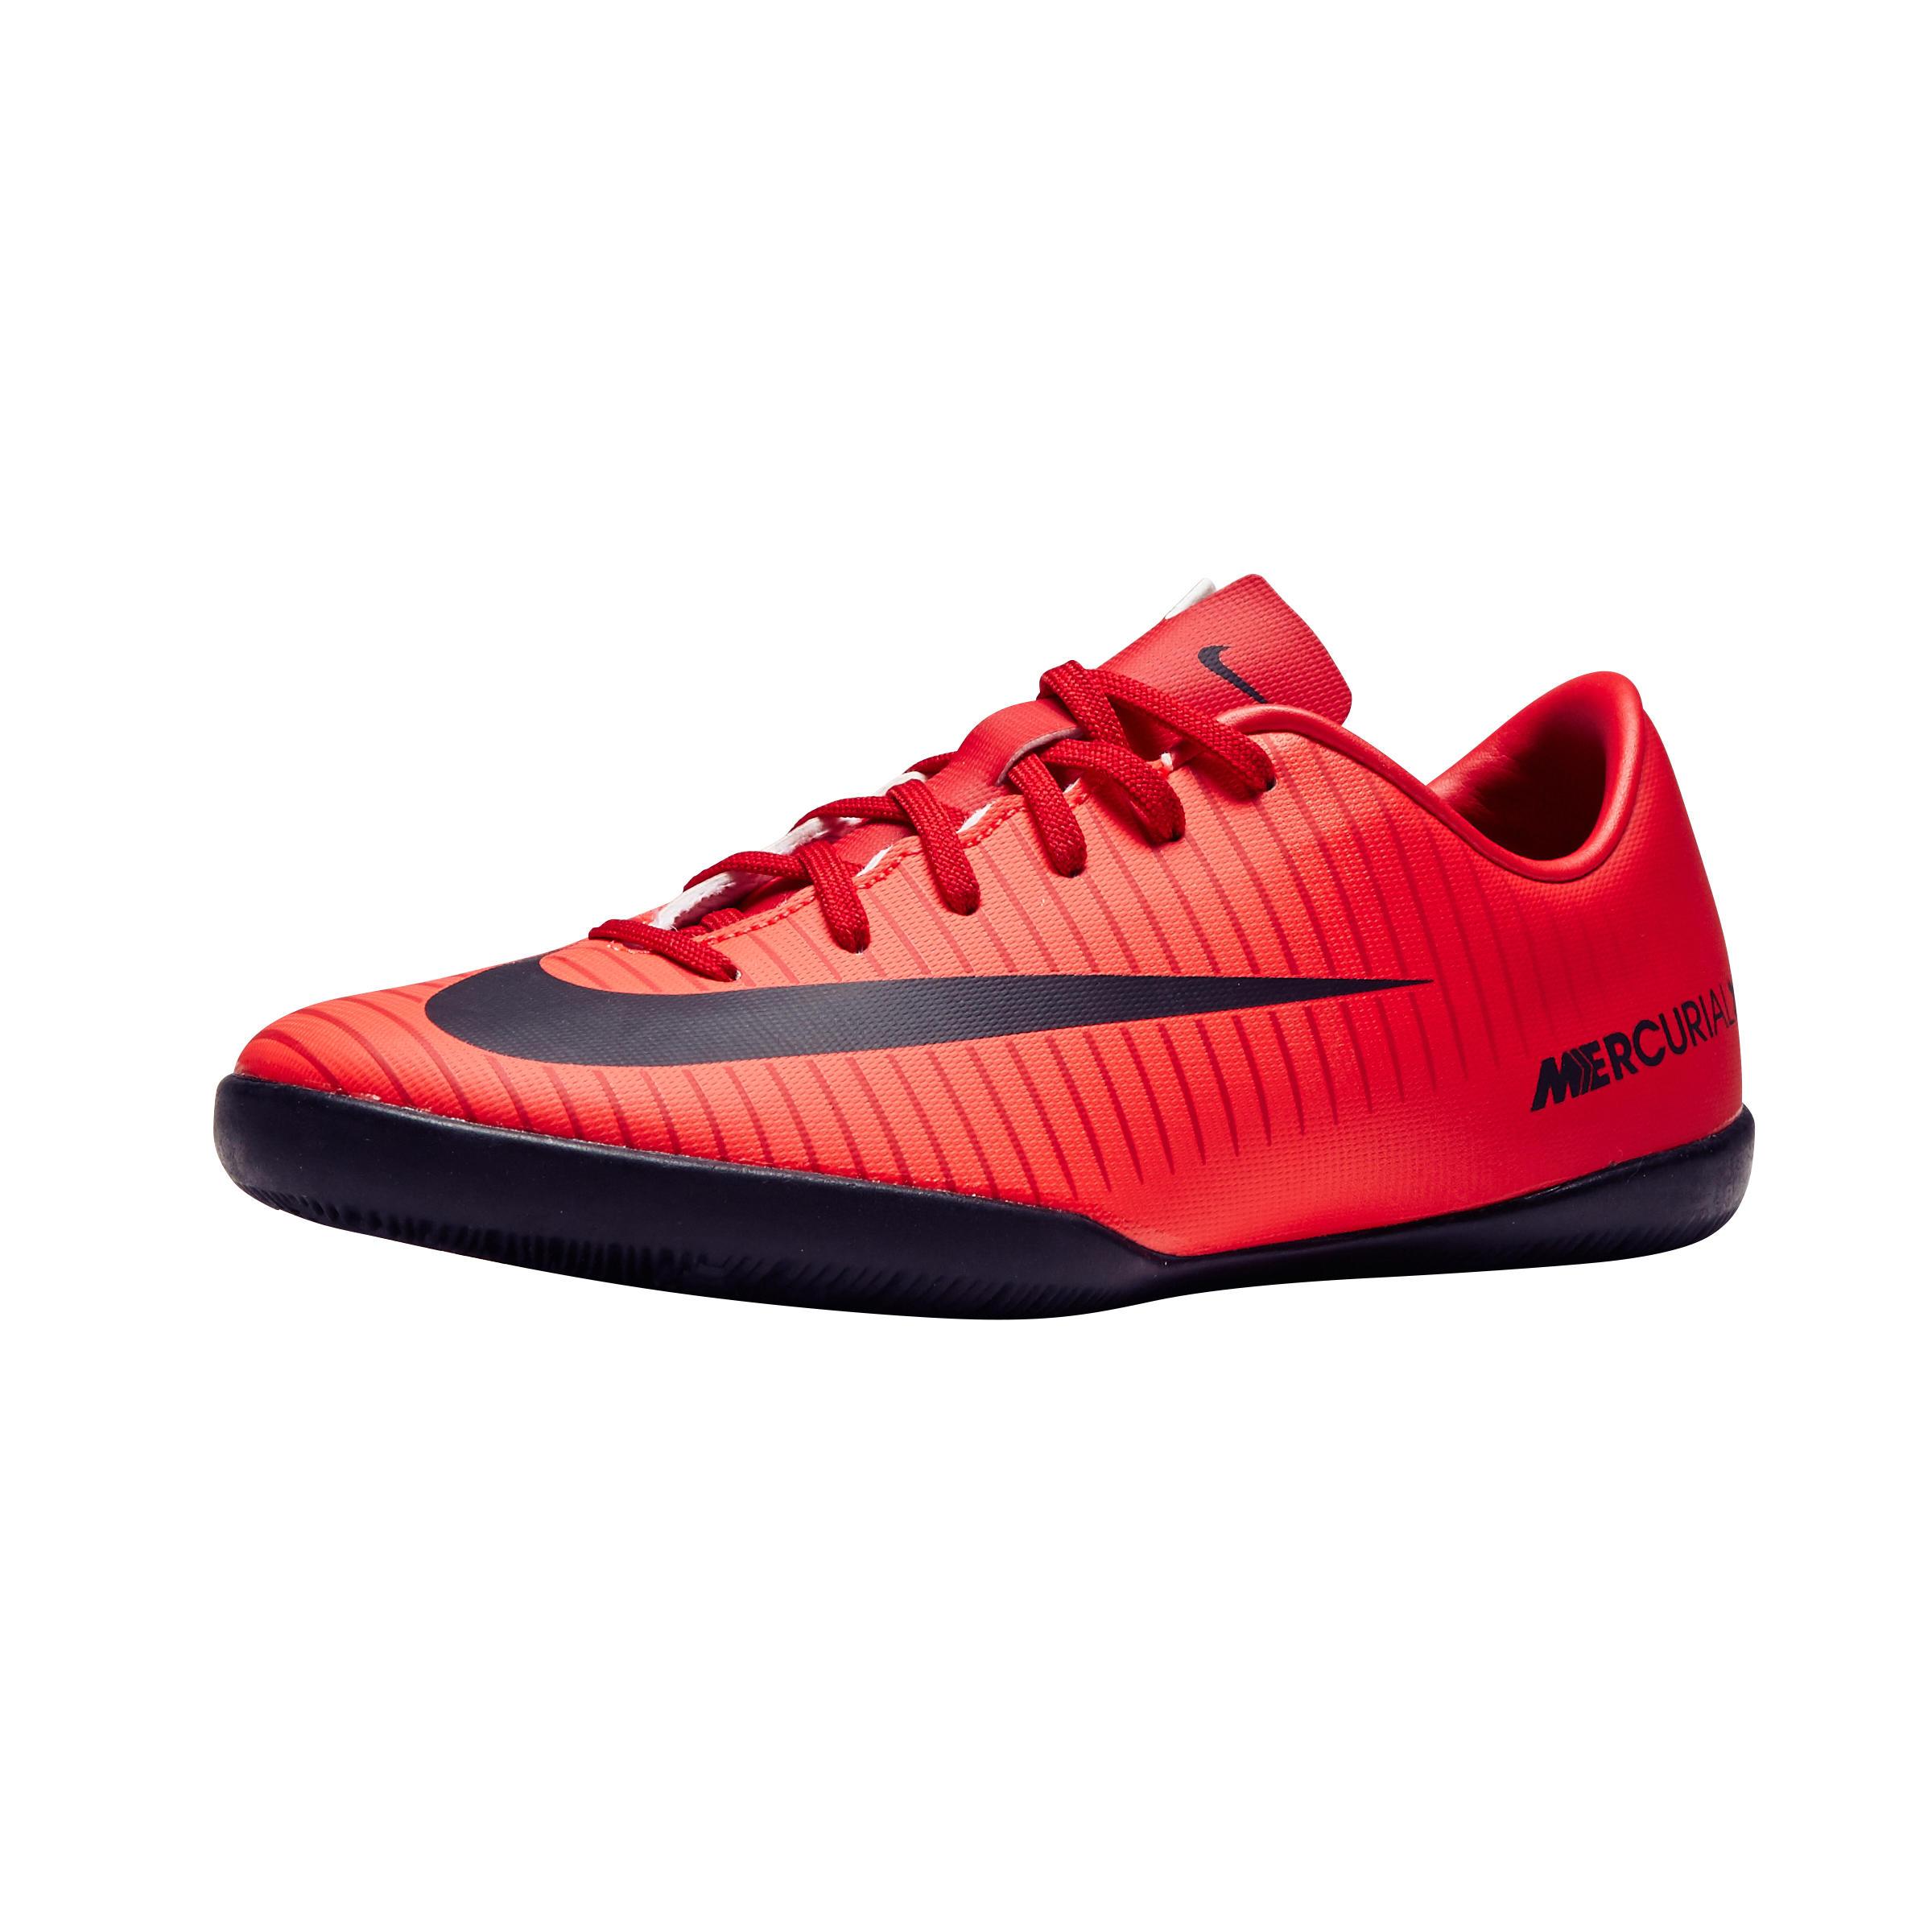 Nike Zaalvoetbalschoenen kind MercurialX Victory VI rood